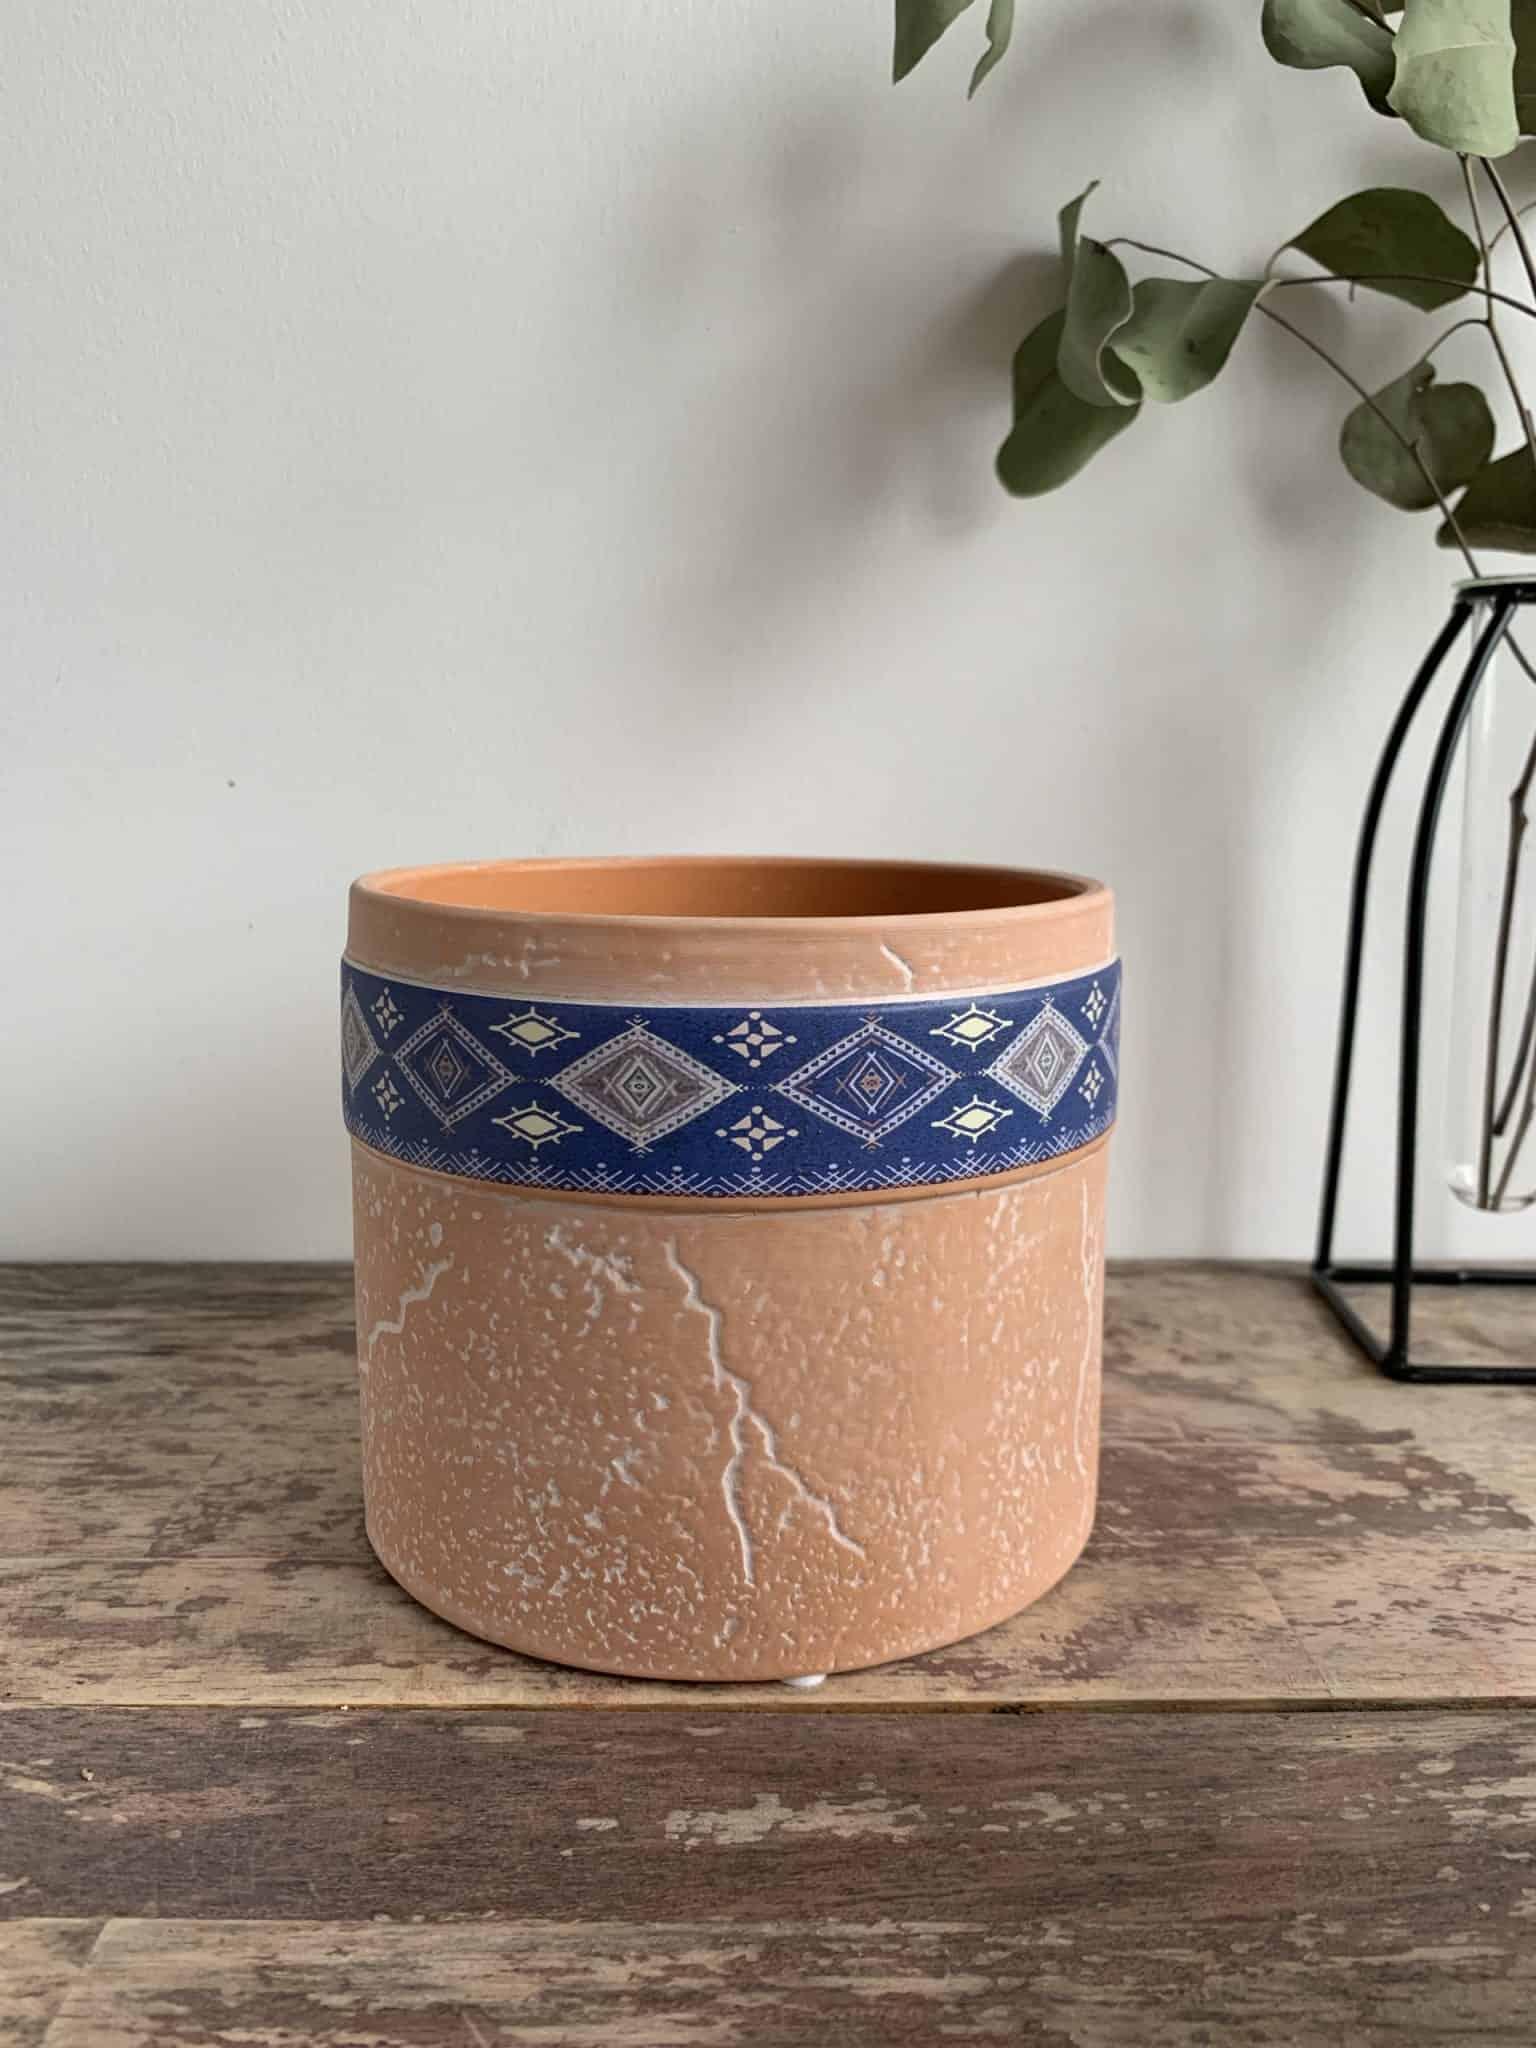 Terra Cylinder Planter for up to 12cm Pots - Blue Pattern